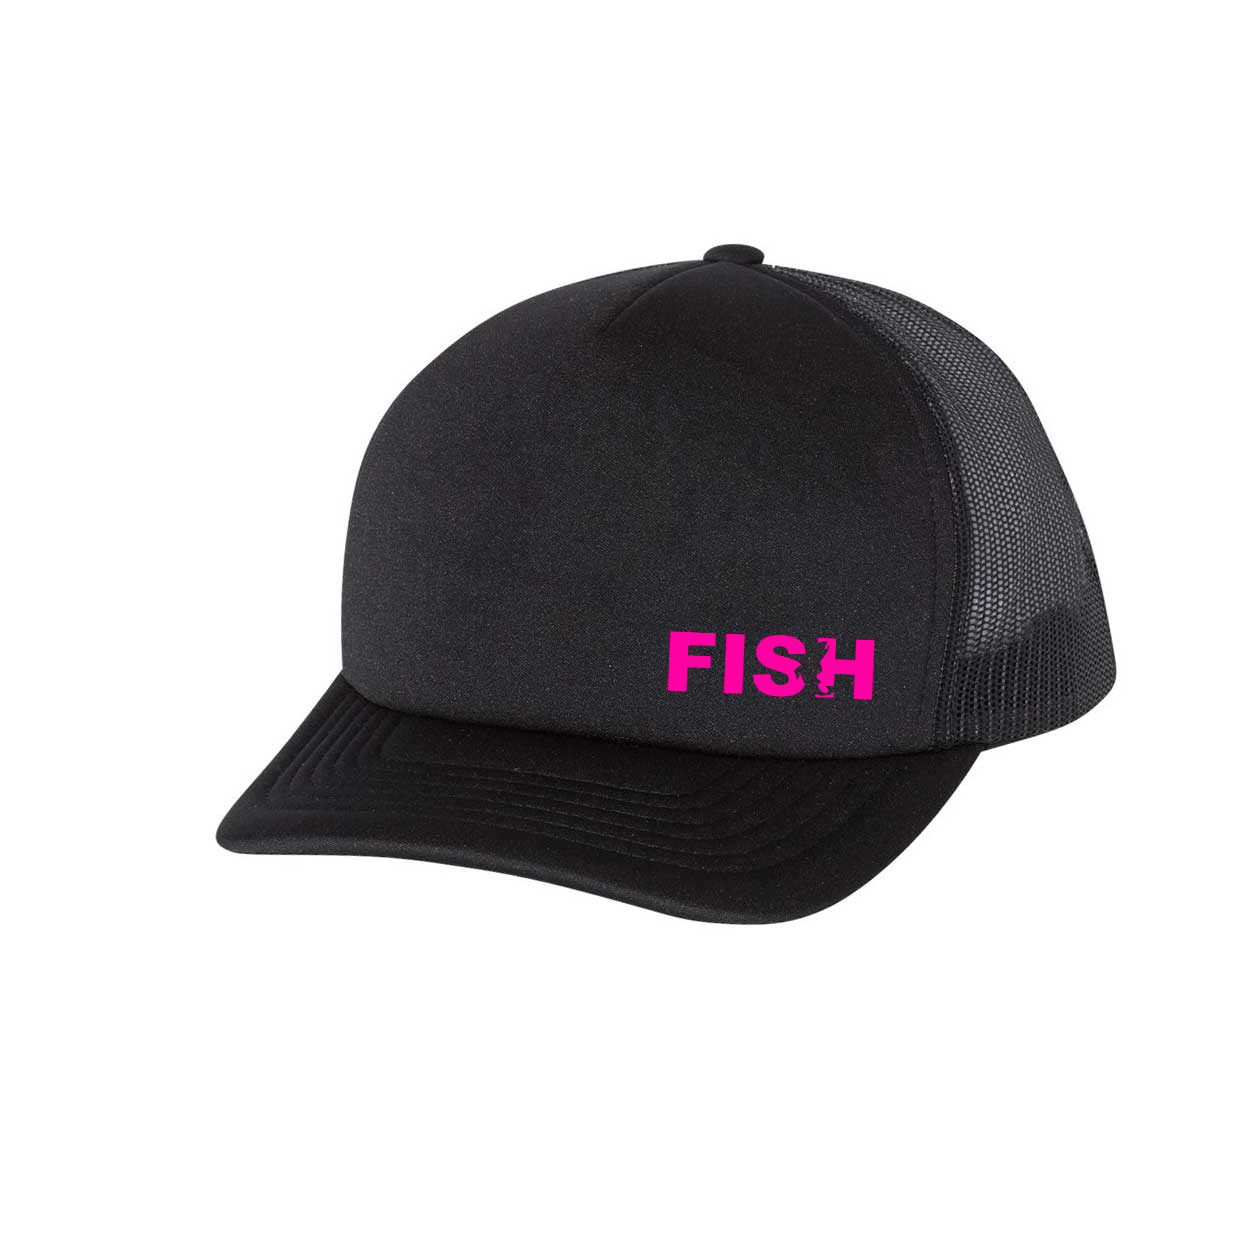 Fish Catch Logo Night Out Premium Foam Trucker Snapback Hat Black (Pink Logo)